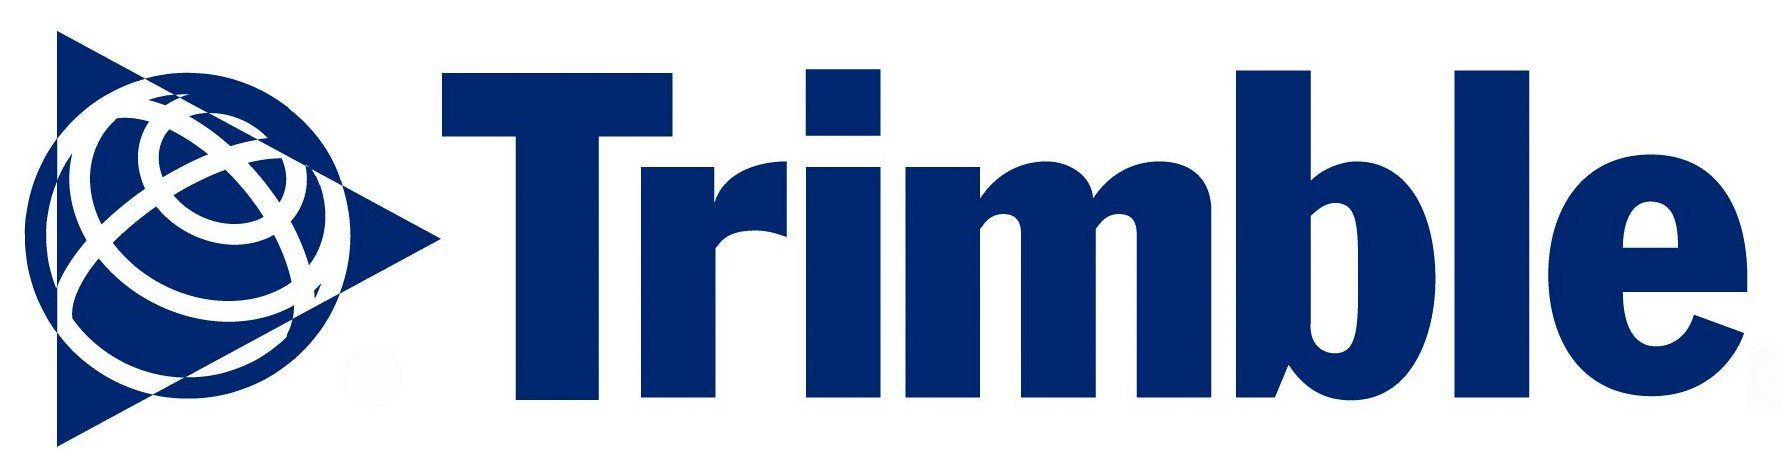 trimble-1